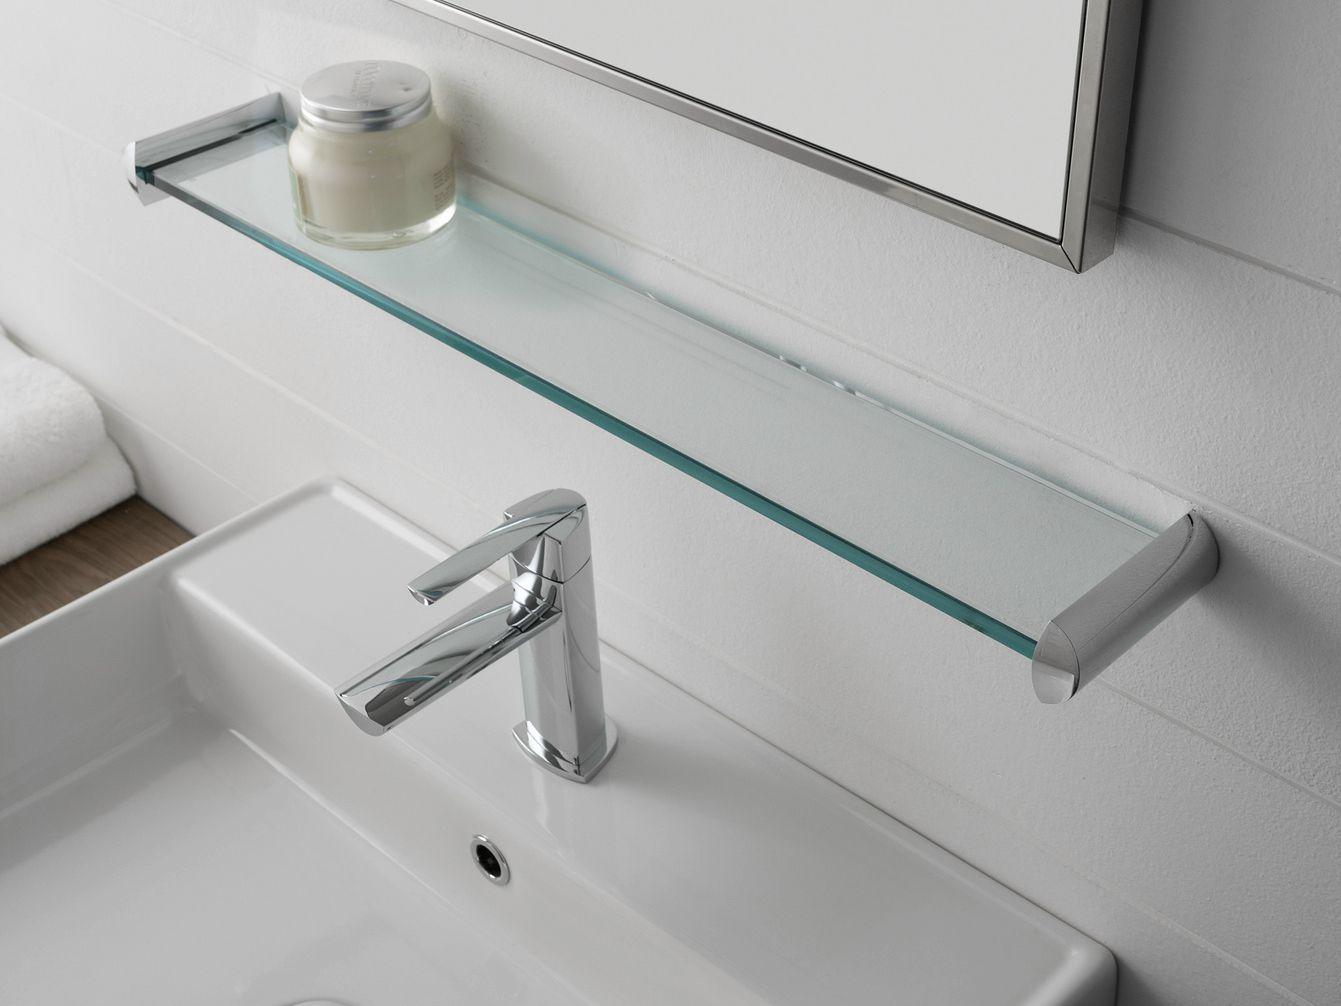 Prateleira para banheiros de vidro TANGO Prateleira para banheiros  #406969 1341x1006 Banheiro Autocad 3d